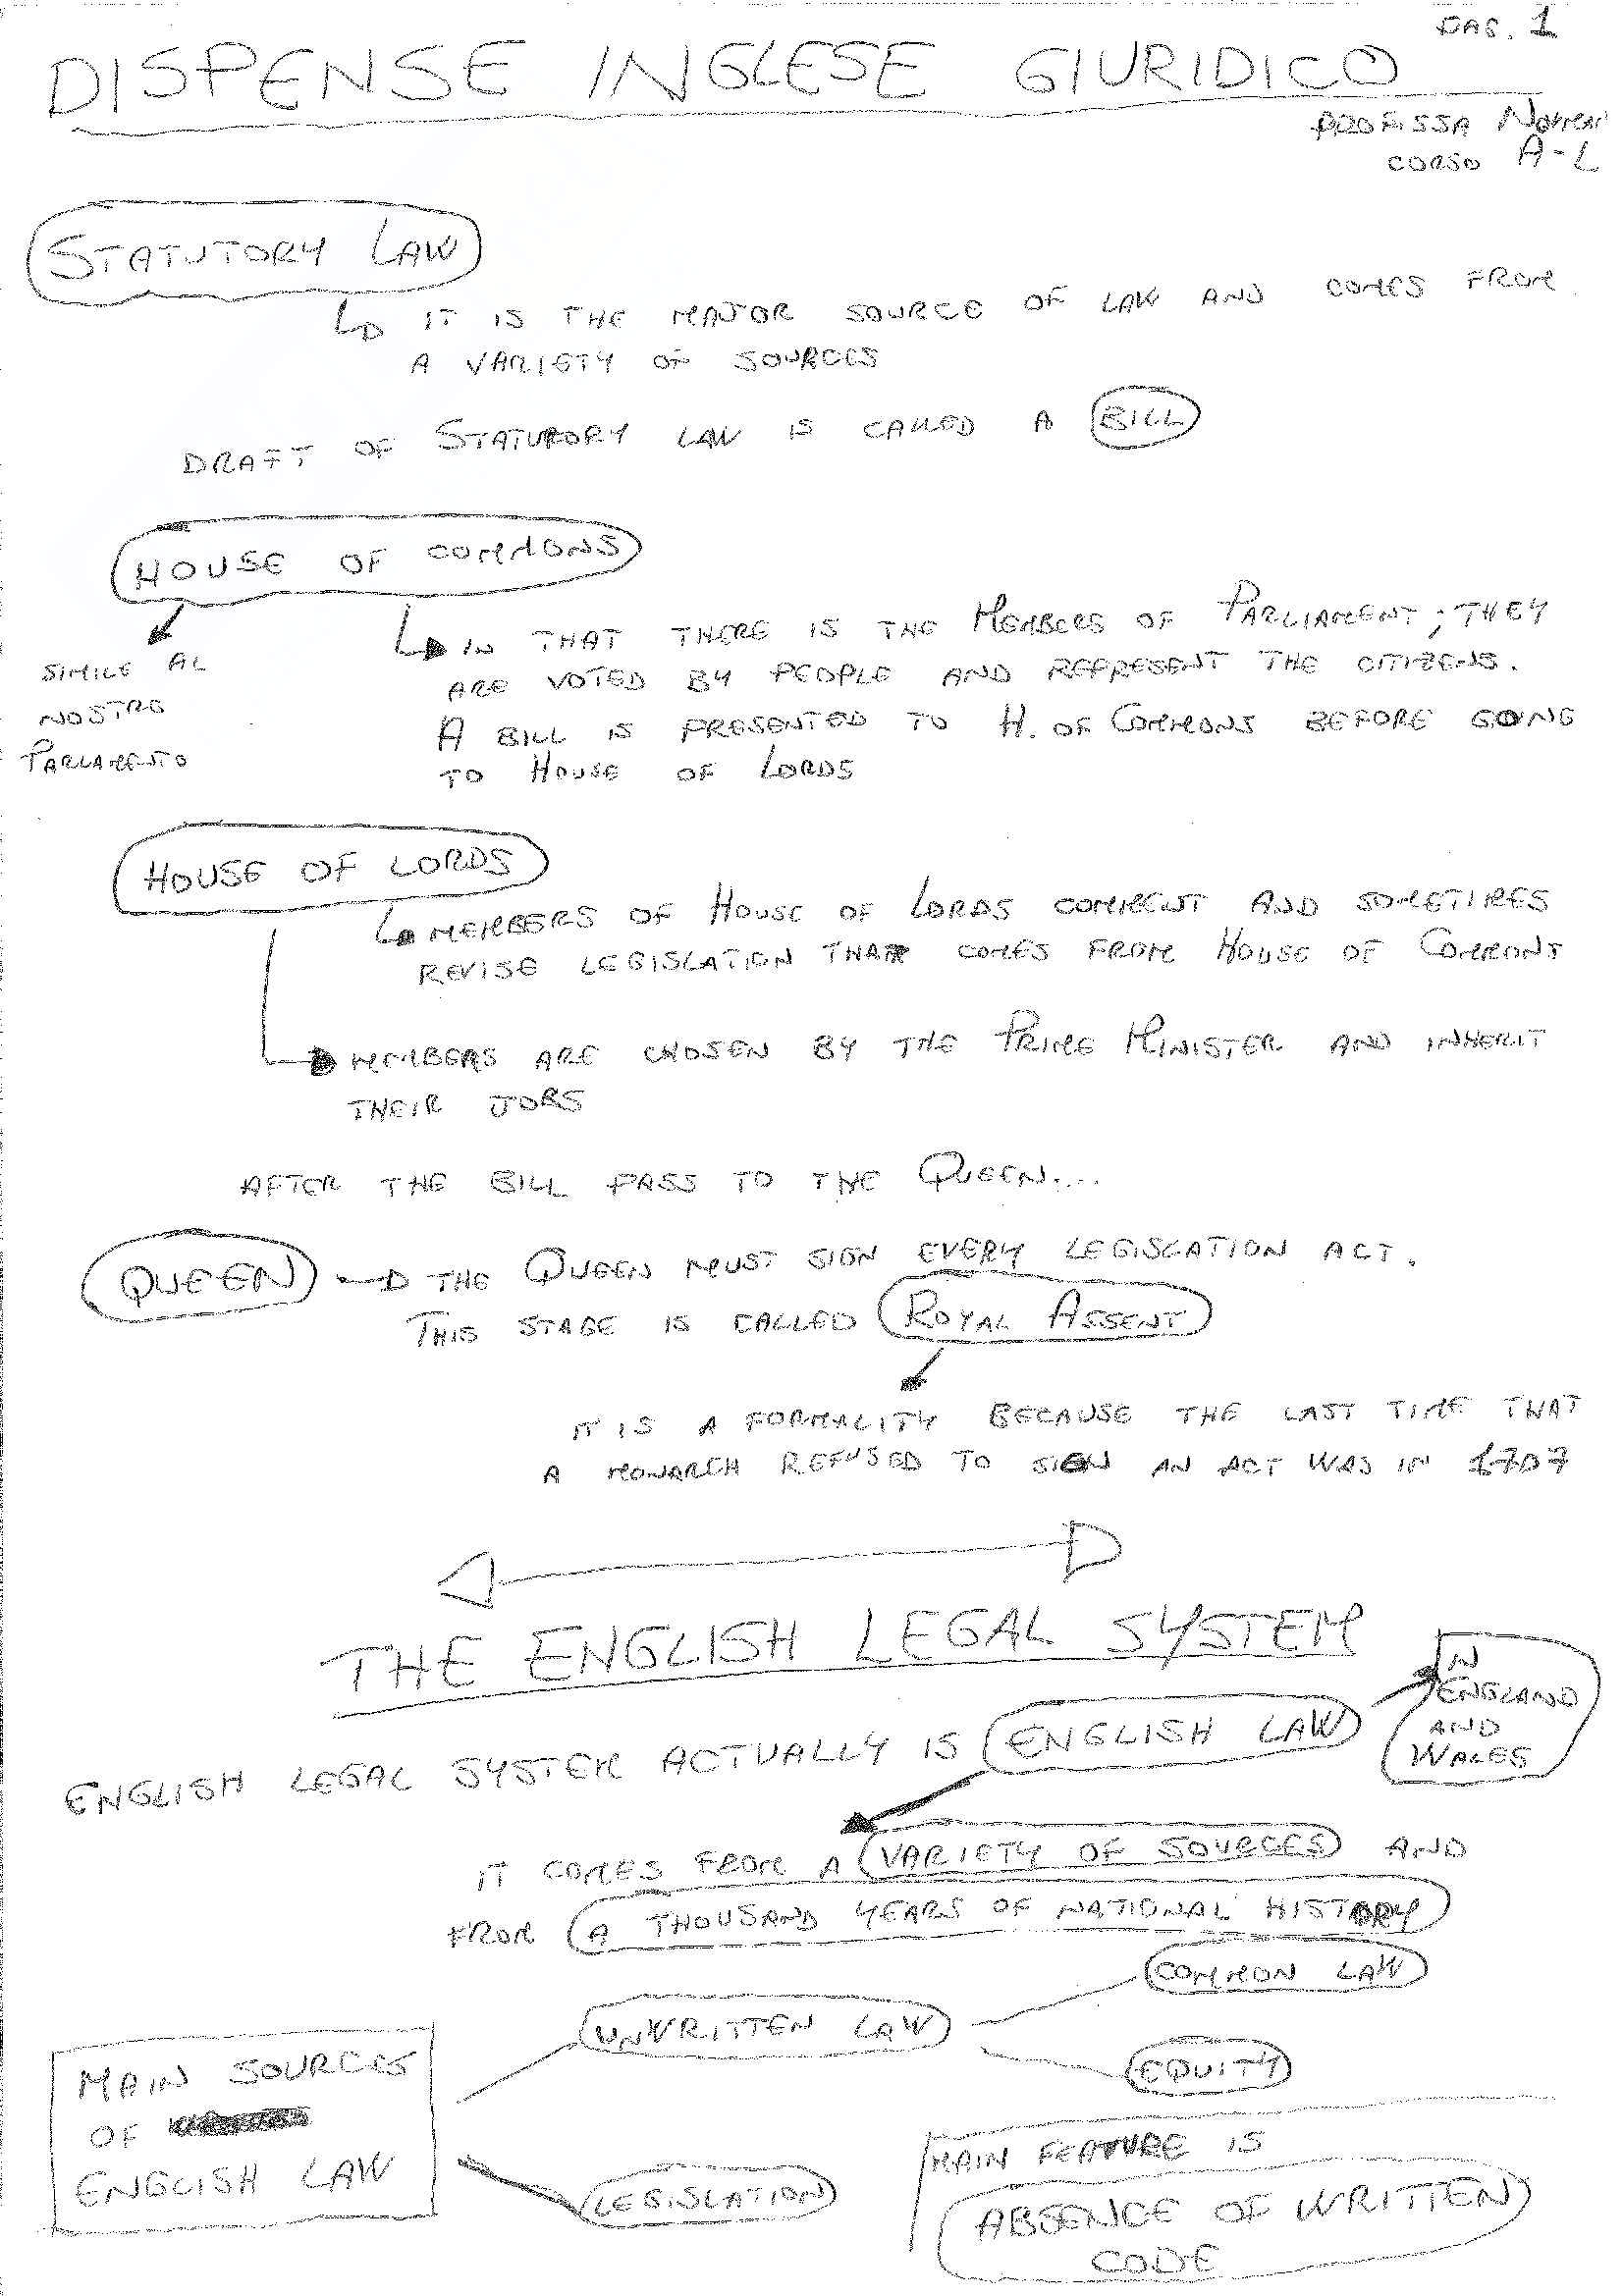 Lingua giuridica inglese